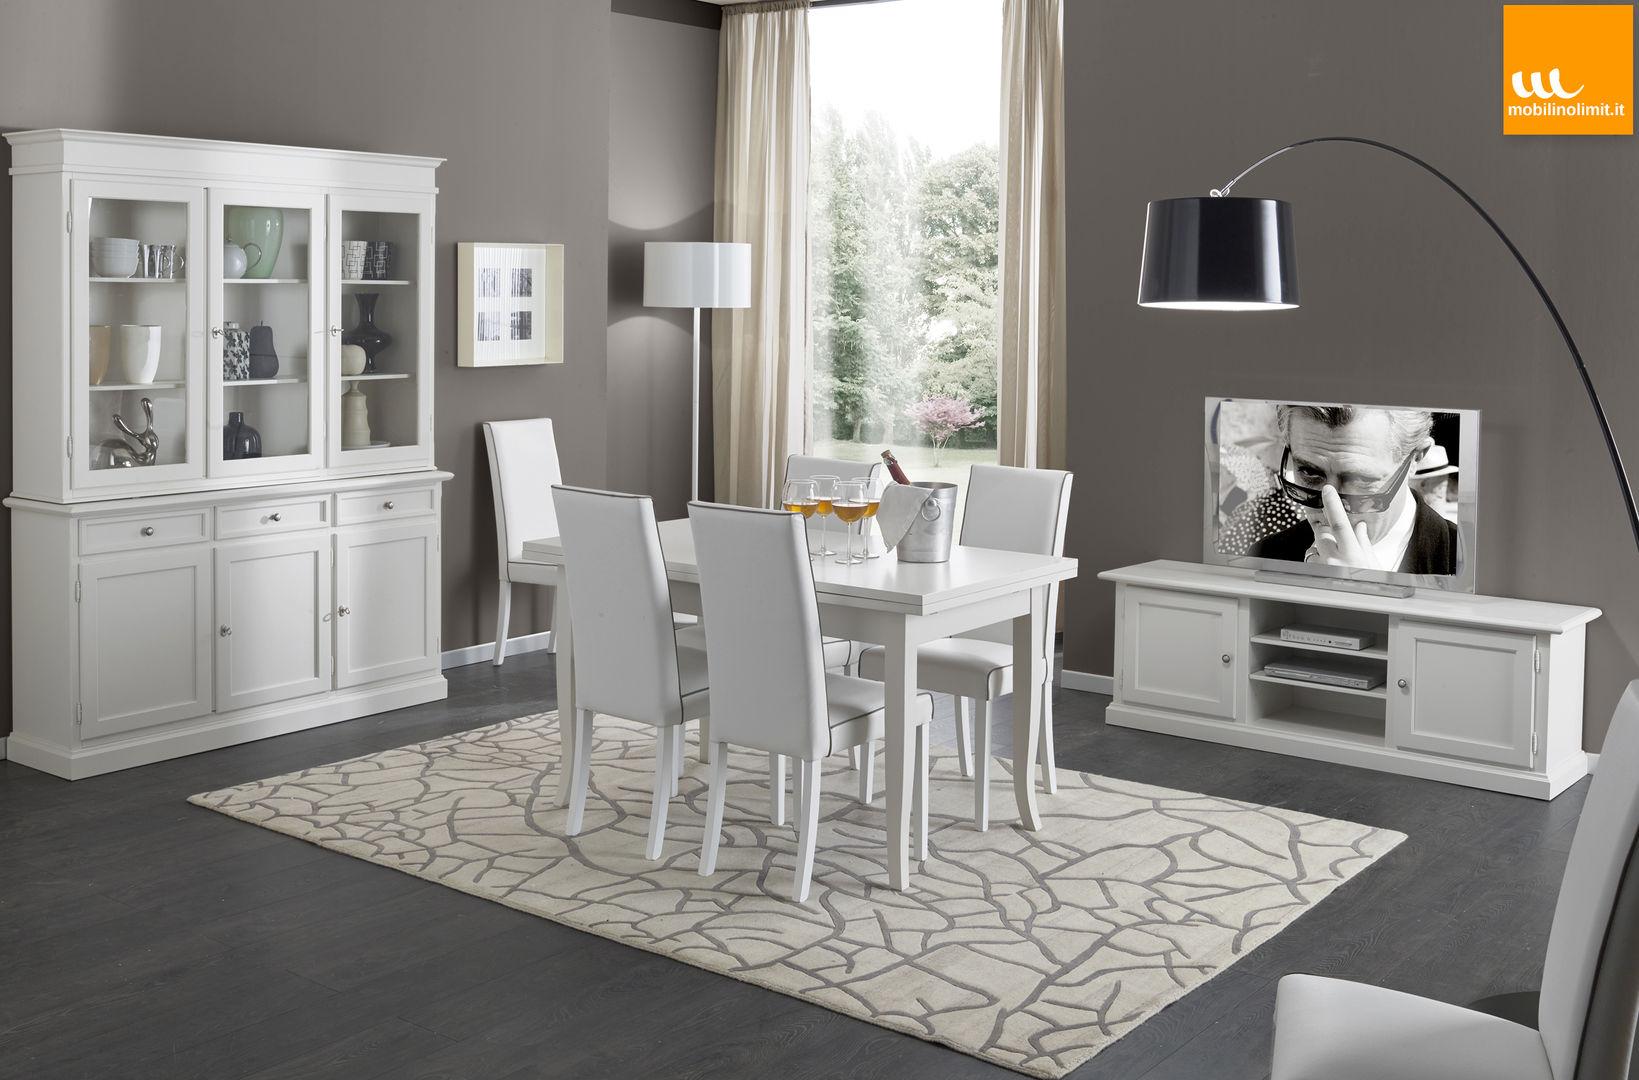 Conosciuto Idee Arredamento Casa & Interior Design | homify FN65